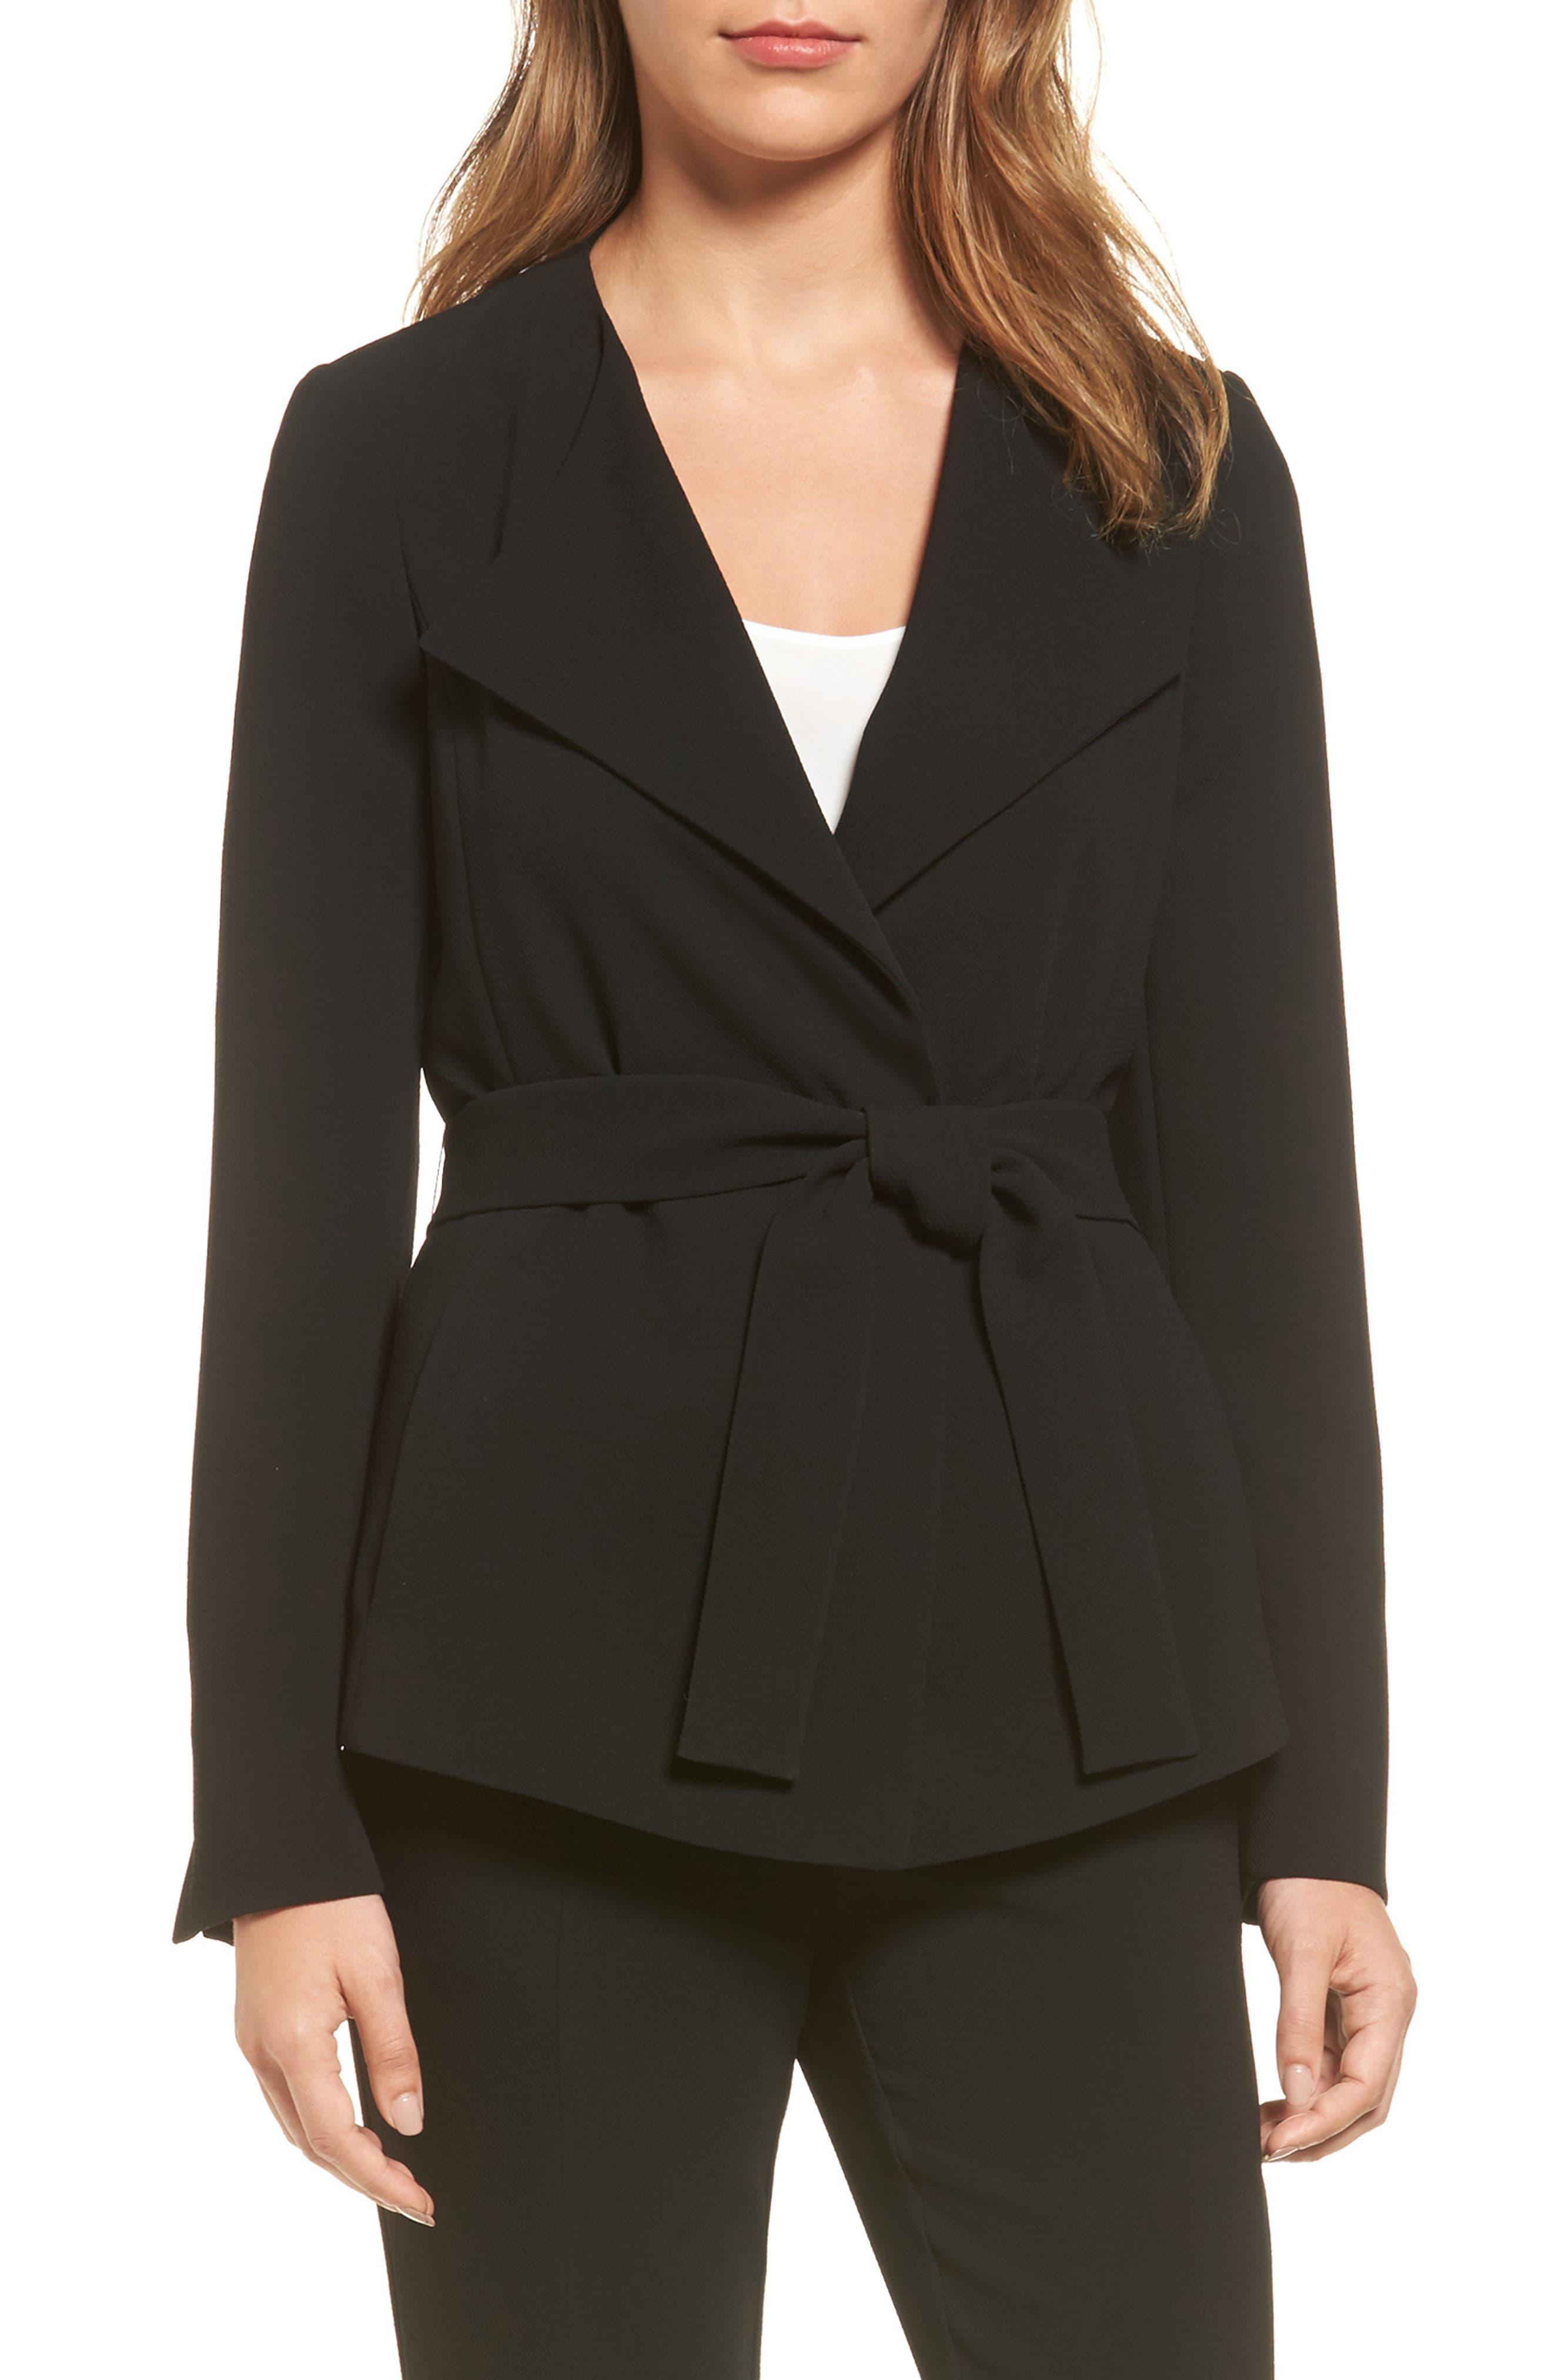 BOSS Karelina Belted Suit Jacket (Regular & Petite)